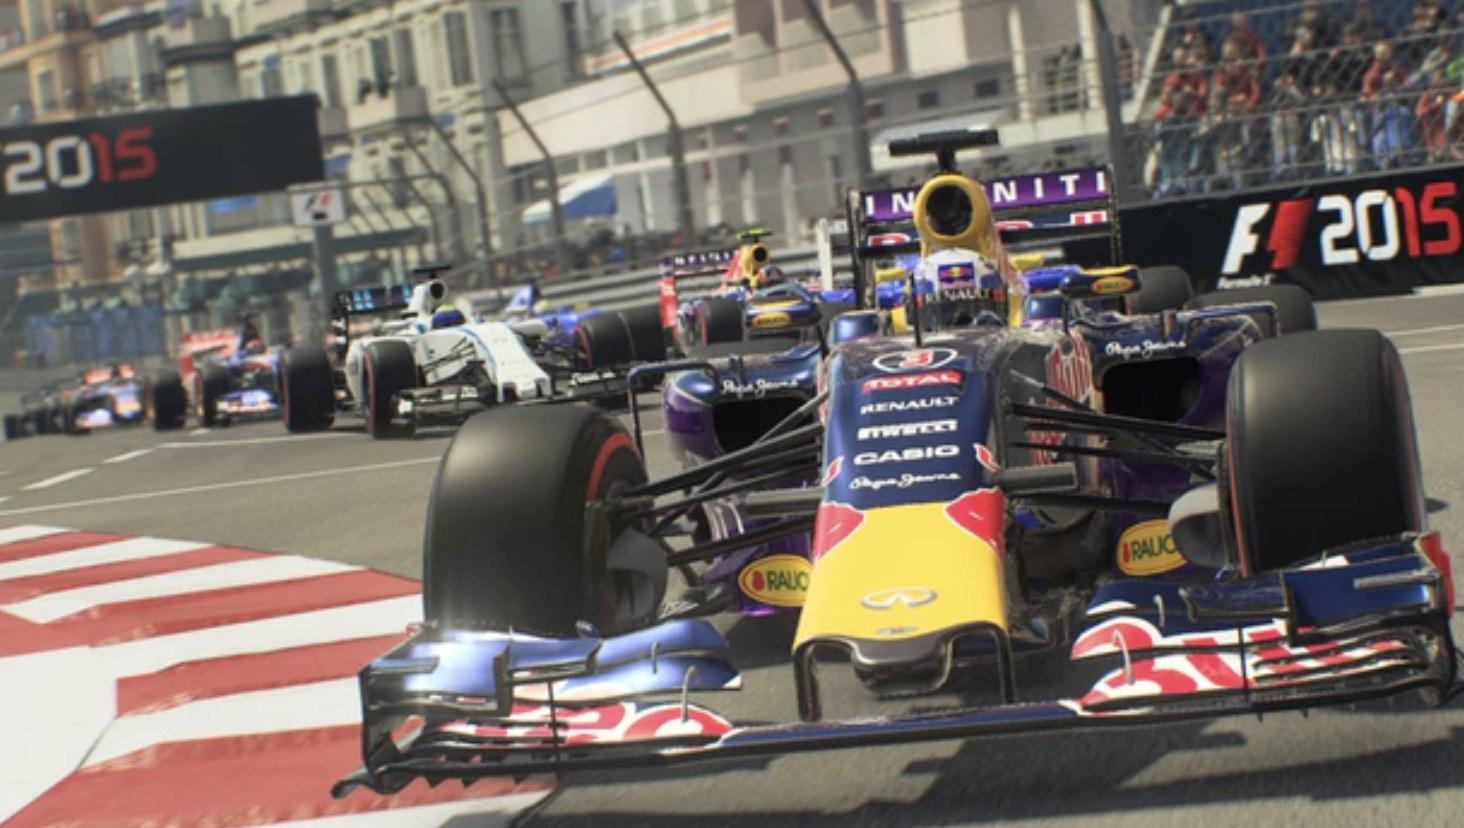 Formel 1 2015 - Screenshot